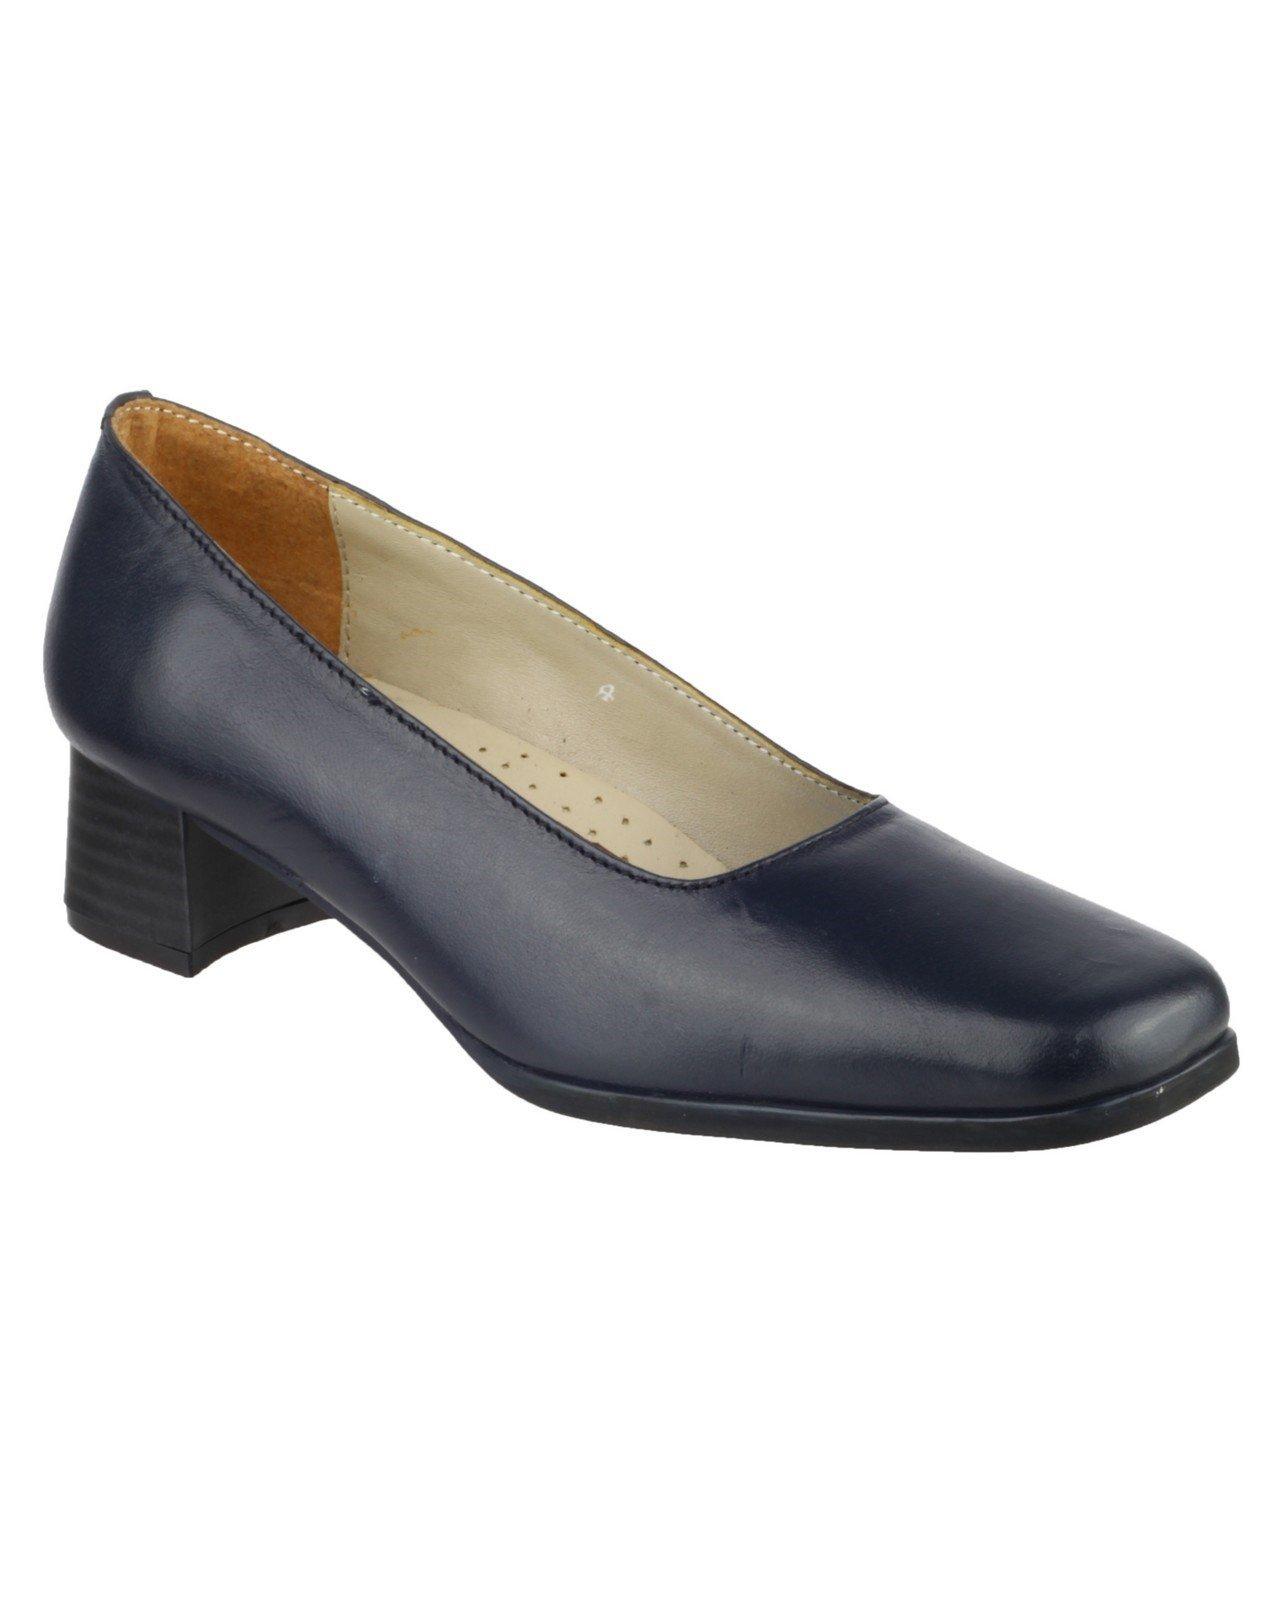 Amblers Women's Walford Ladies Leather Court Shoe Black 15234 - Navy 7